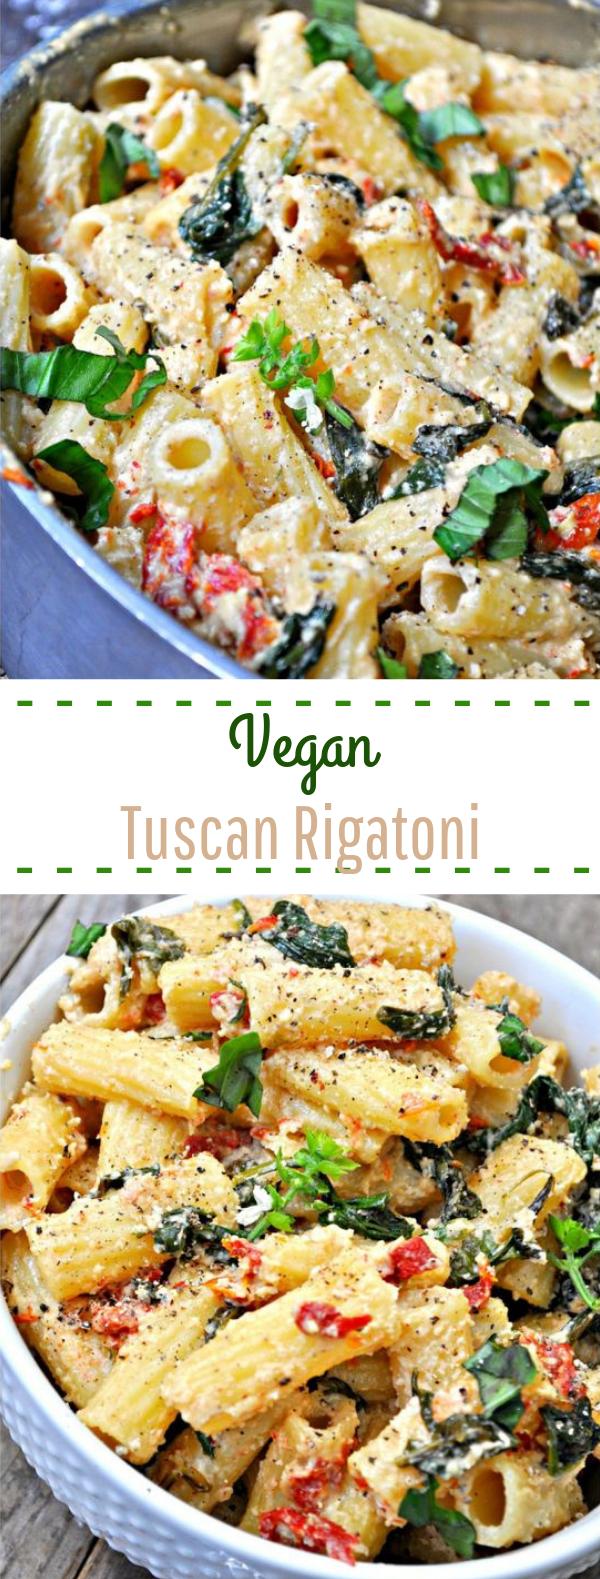 Vegan Tuscan Rigatoni #pasta #vegetarian